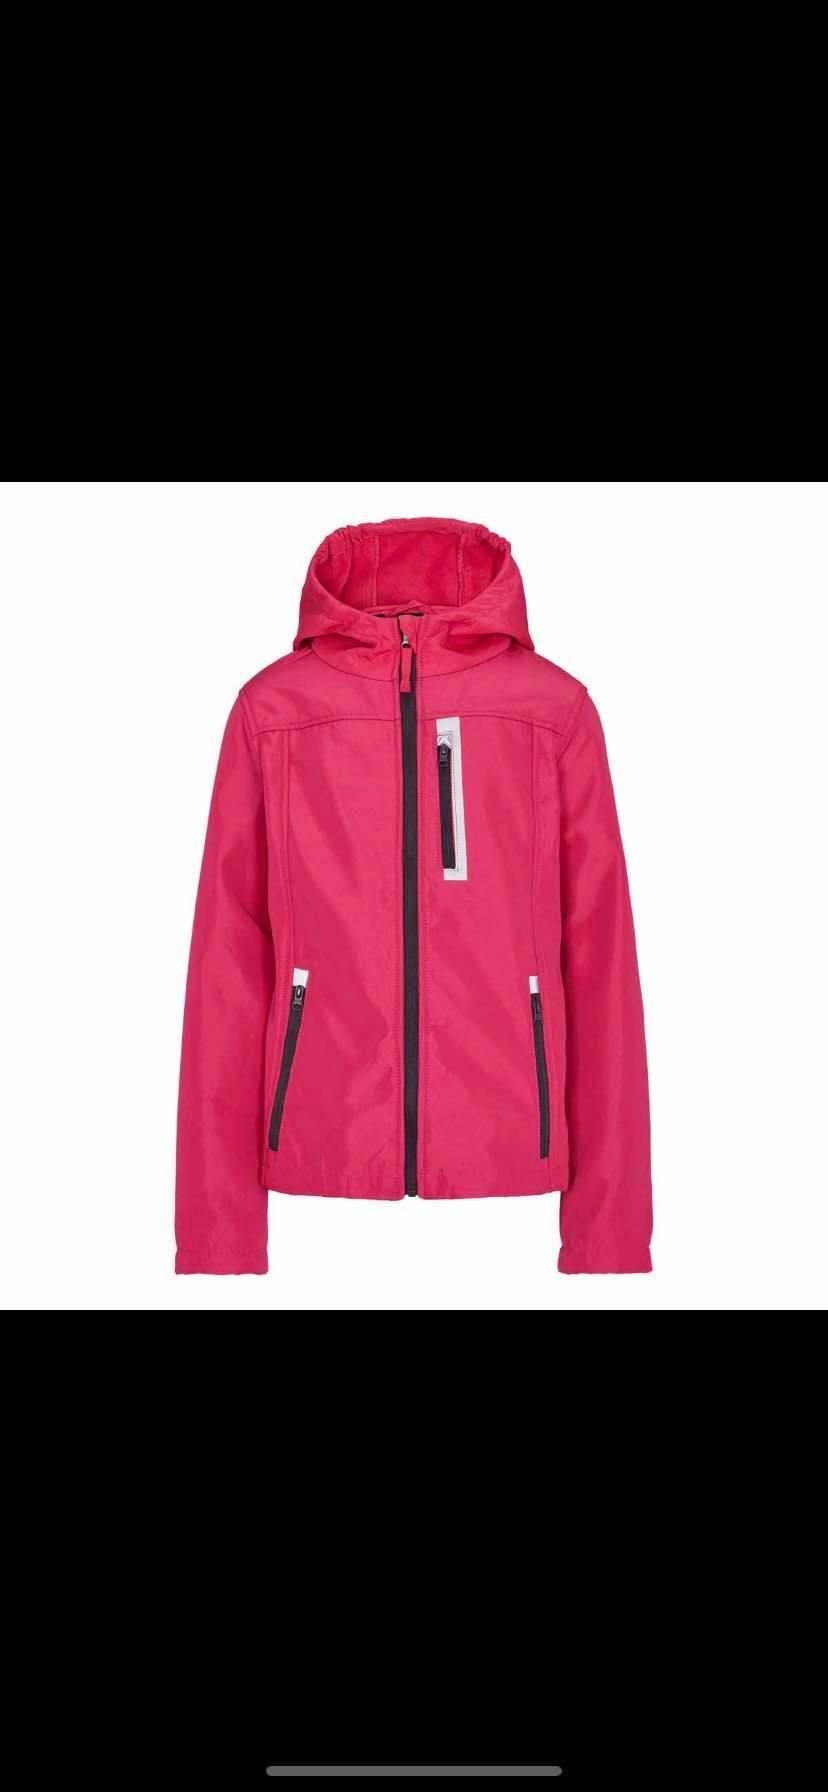 e9eda28d Crane softshell jakker til børn i lyserød str 134-